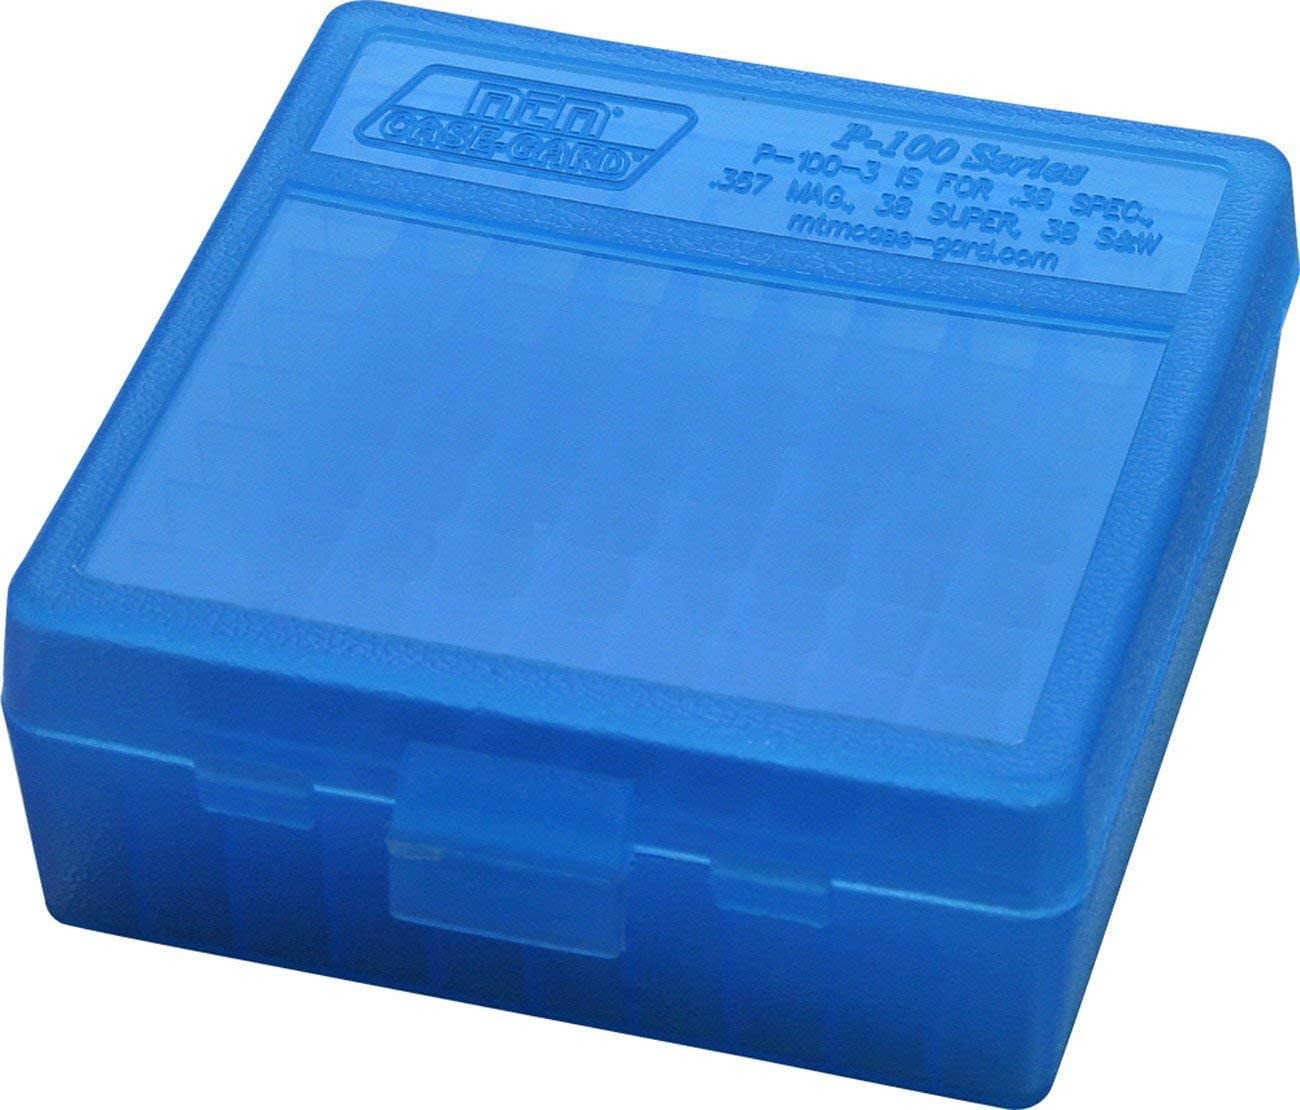 MTM Plastic Ammo Box, Clear Blue 100 Round 38/357 61O0sOVs3vL